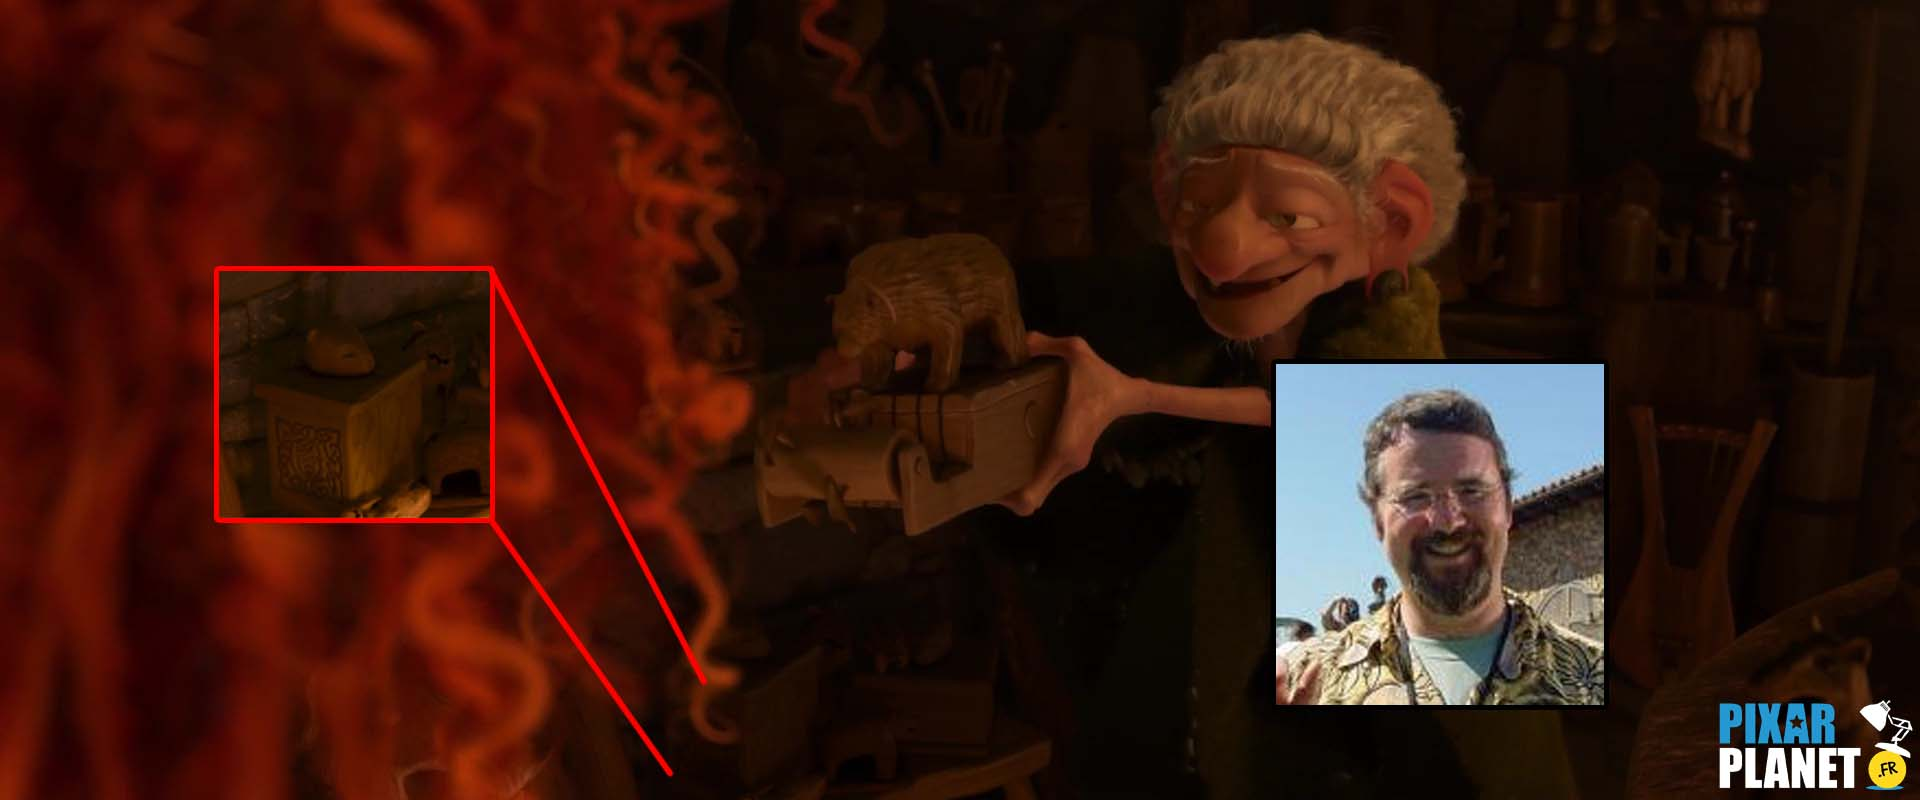 clin oeil rebelle easter egg brave disney pixar